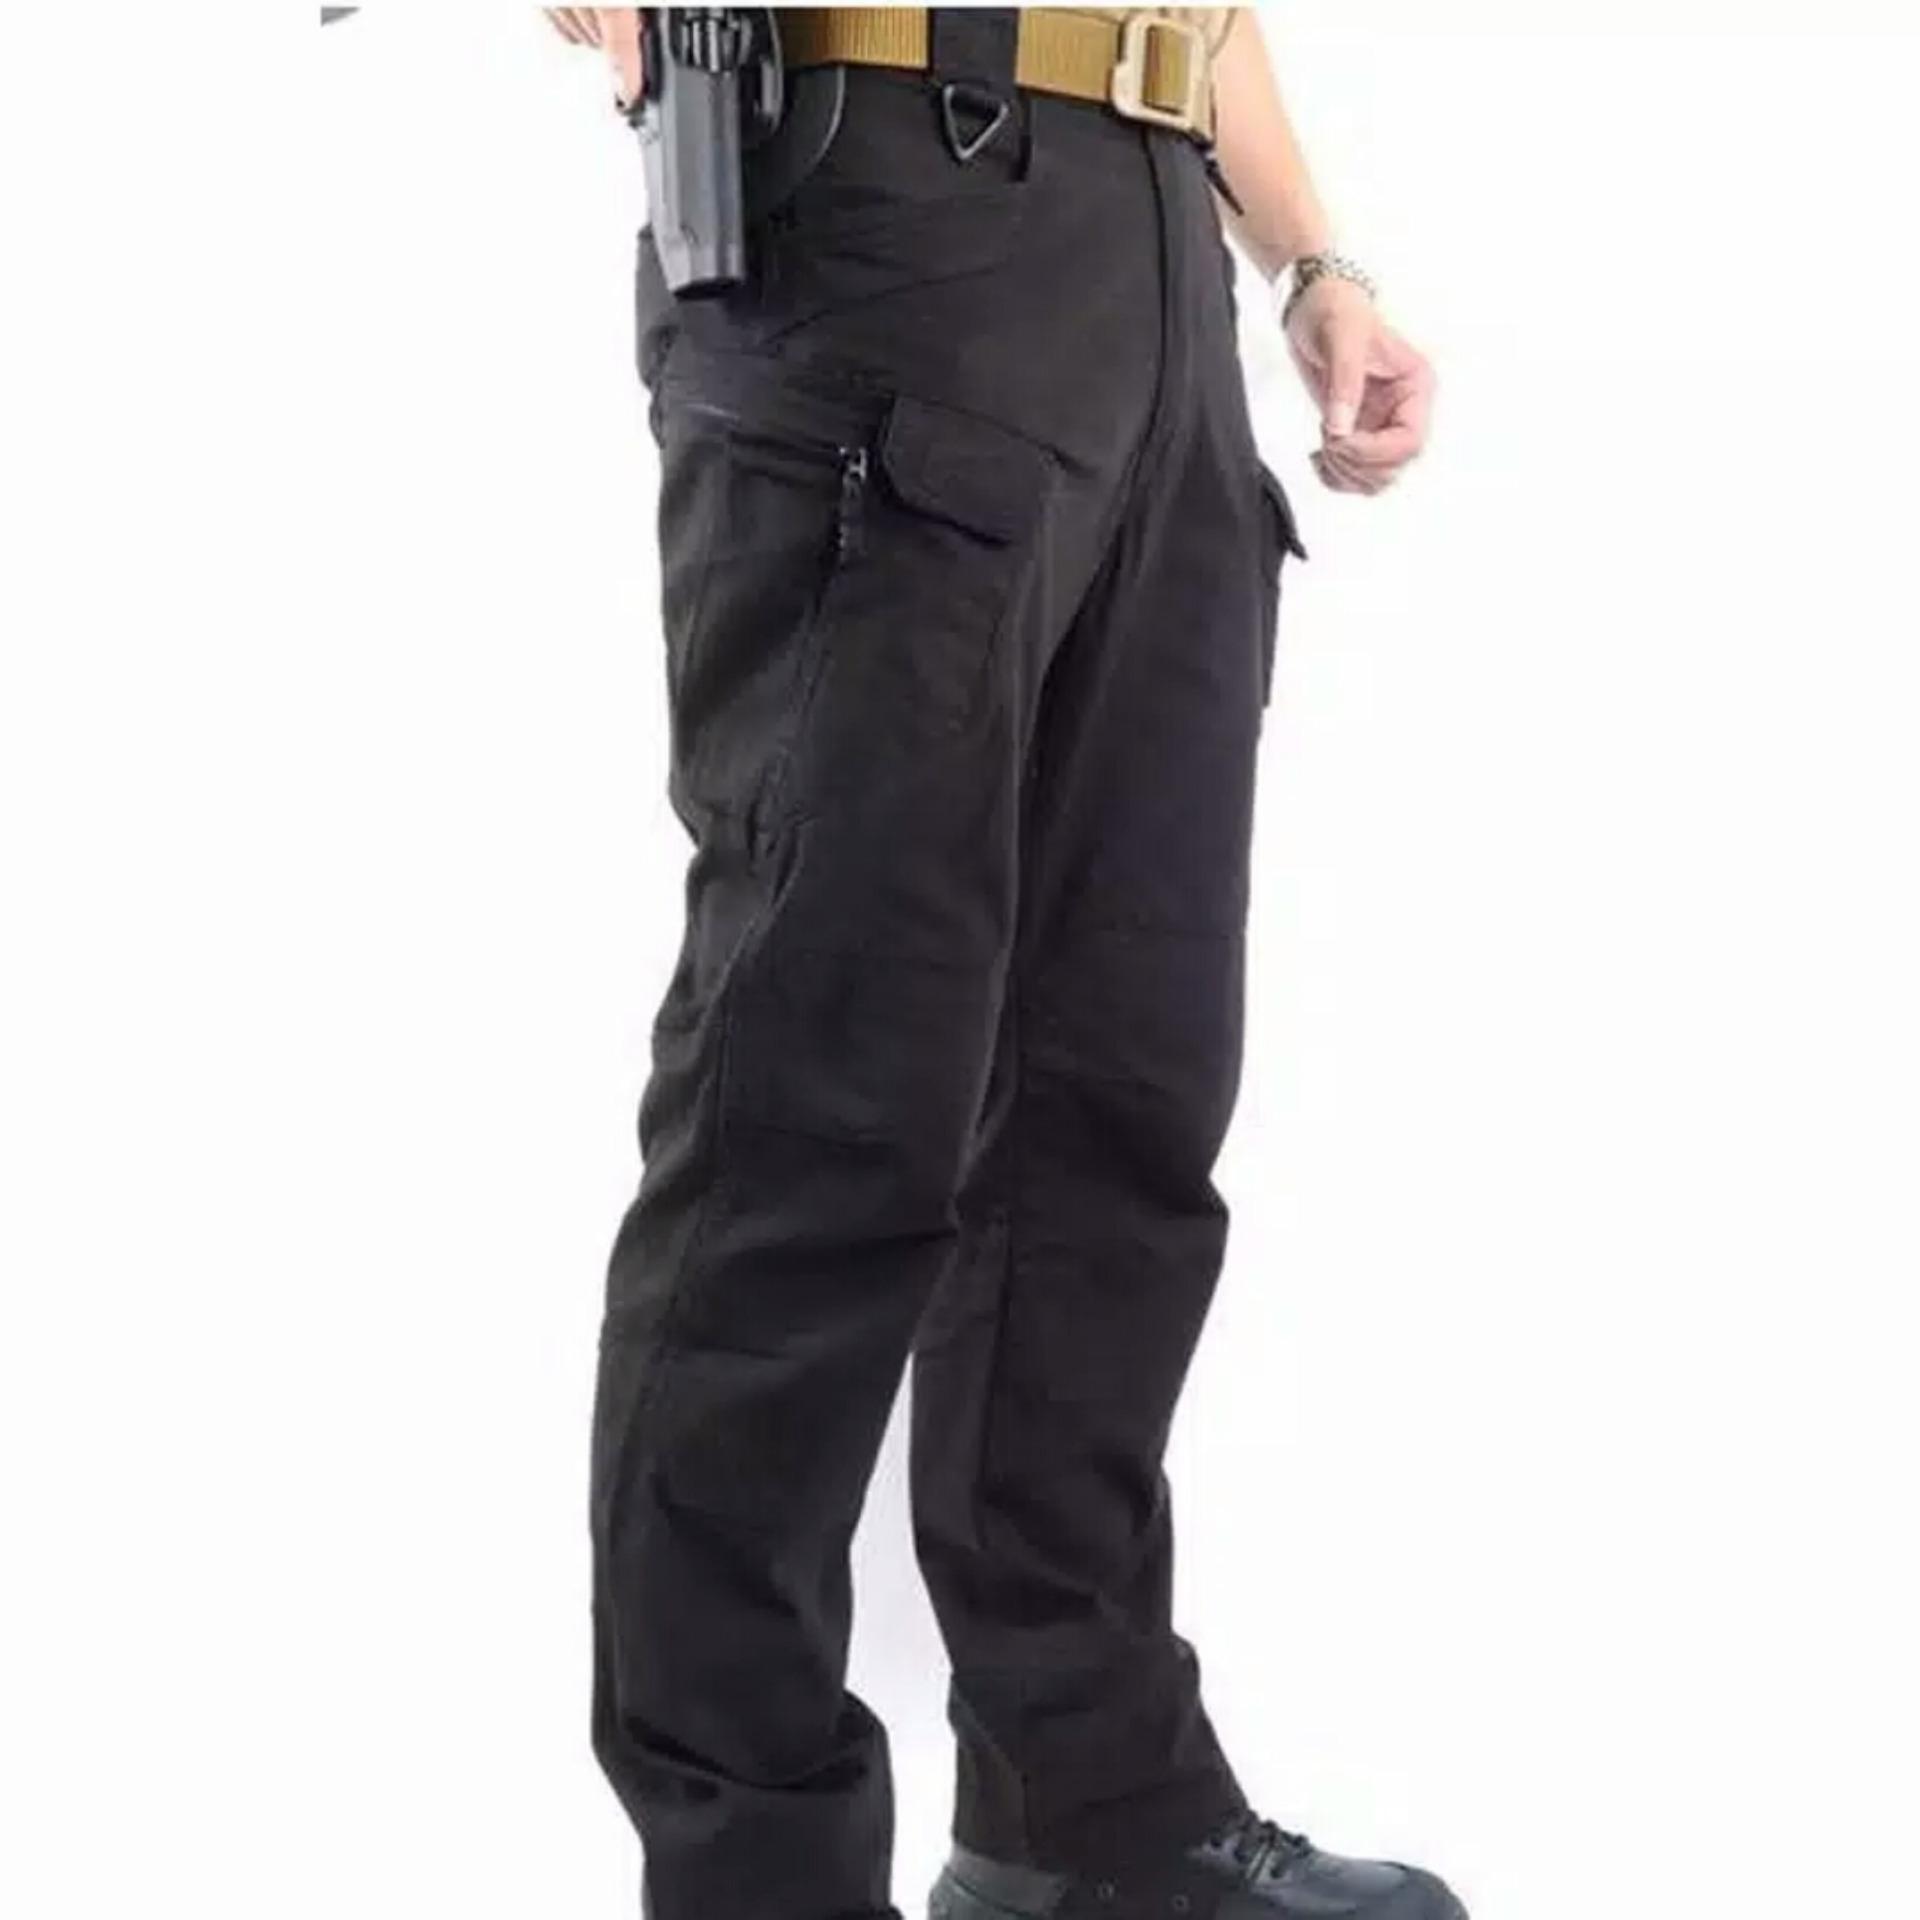 CELANA TACTICAL BLACKHAWK; CELANA TACTICAL BLACKHAWK .